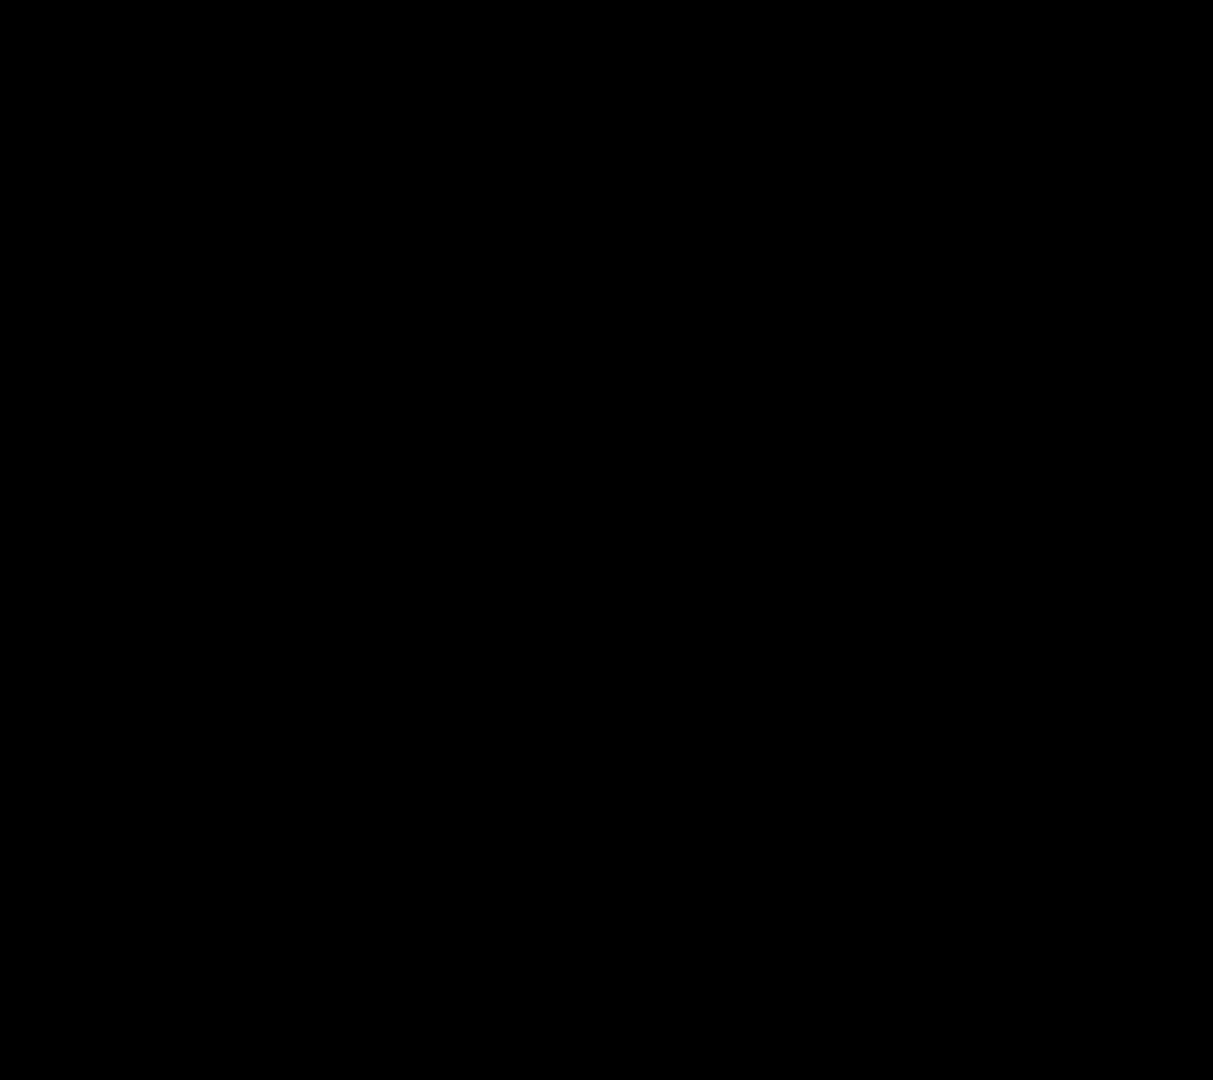 SABO 107 S